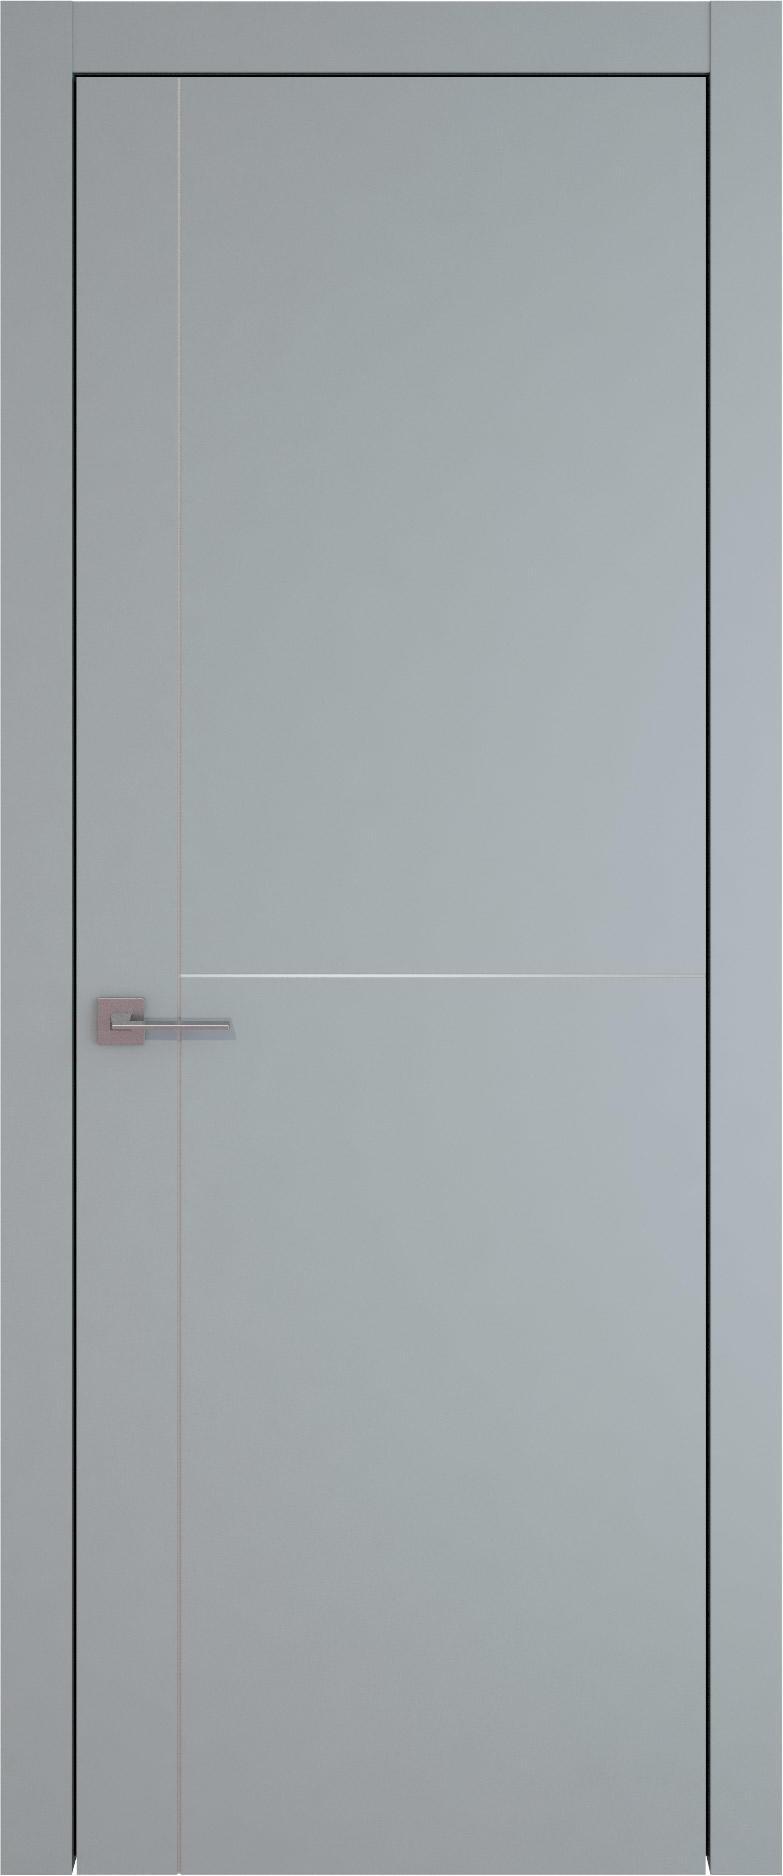 Tivoli Е-3 цвет - Серебристо-серая эмаль (RAL 7045) Без стекла (ДГ)